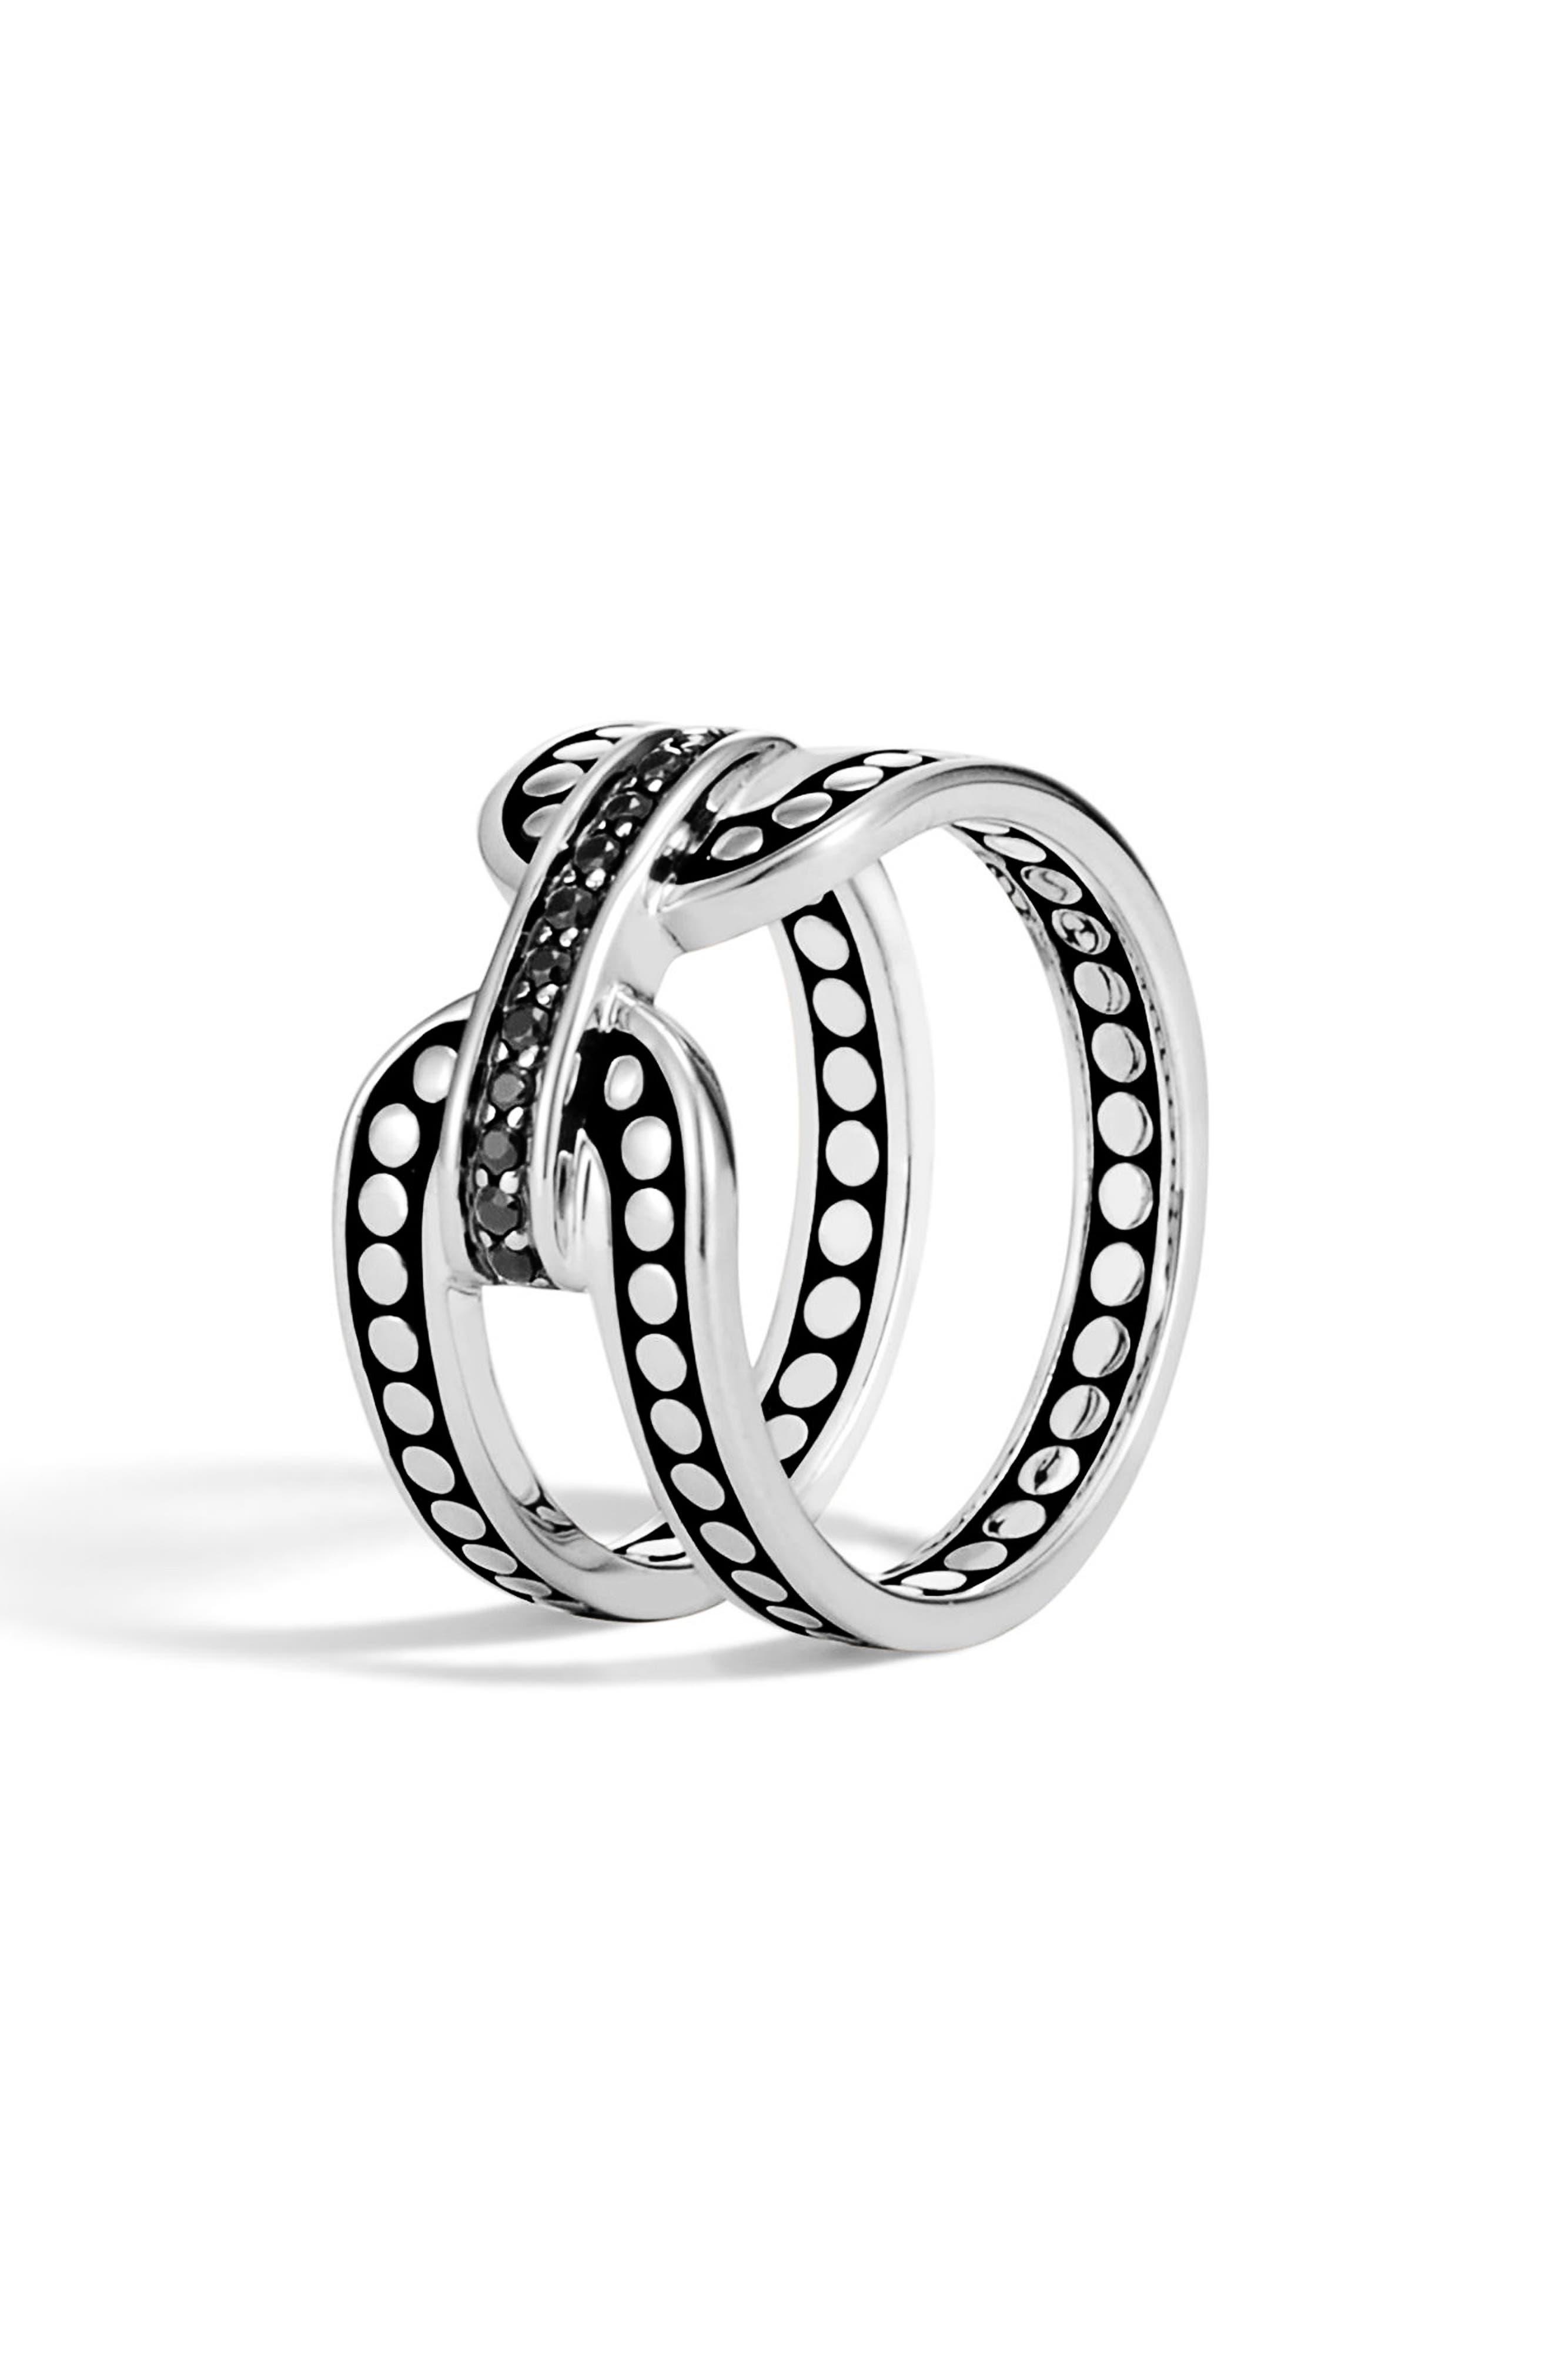 Main Image - John Hardy Dot Silver Ring